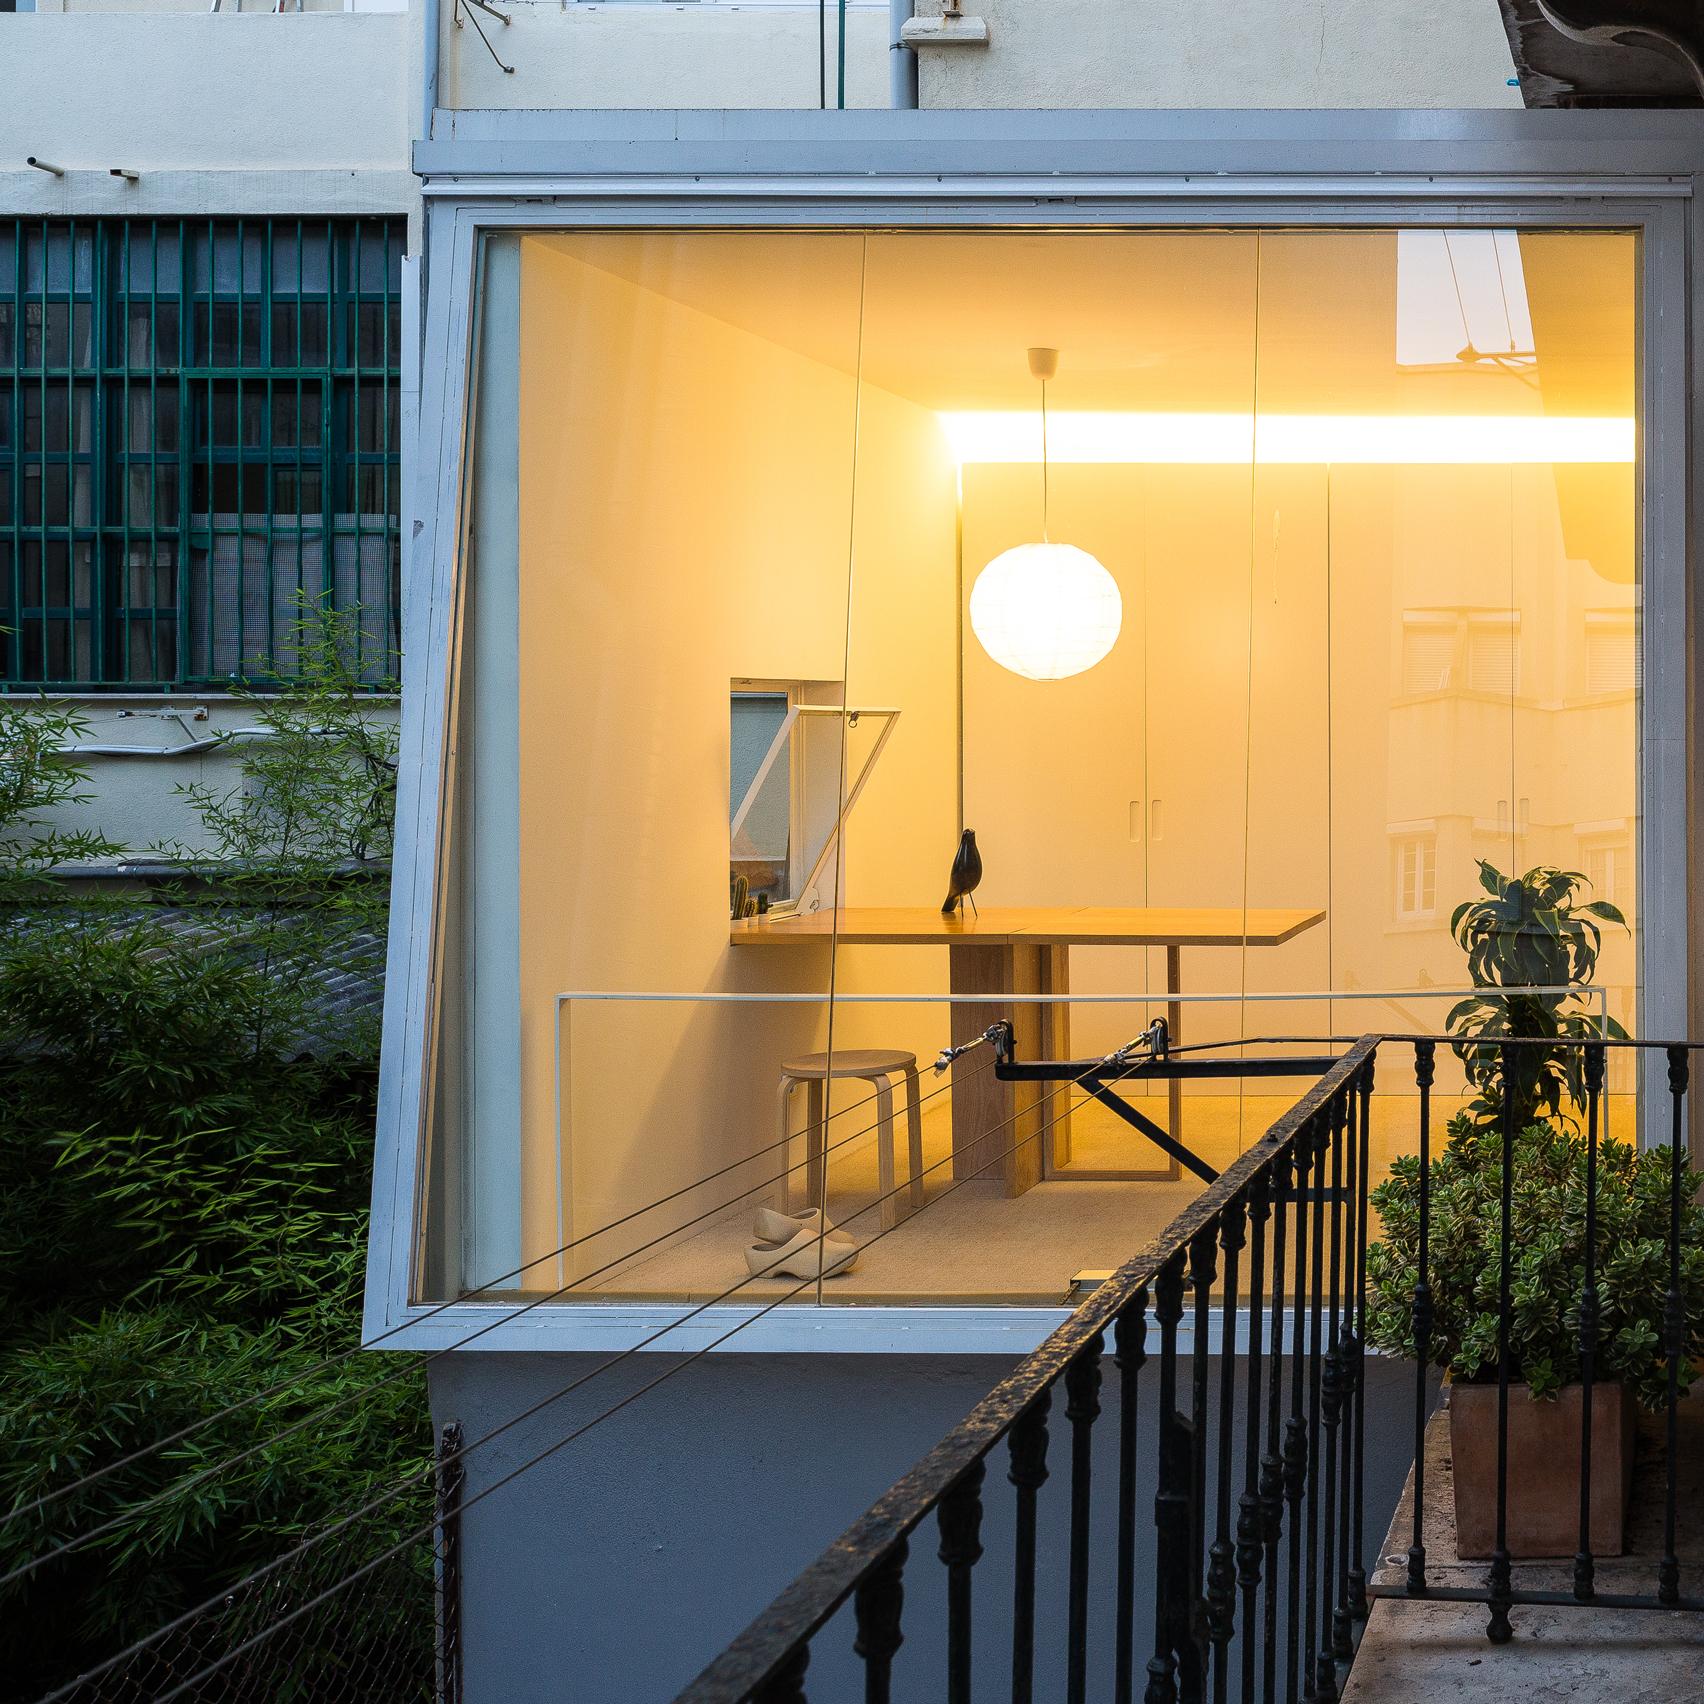 huge window frames garden views from boxy lisbon apartment